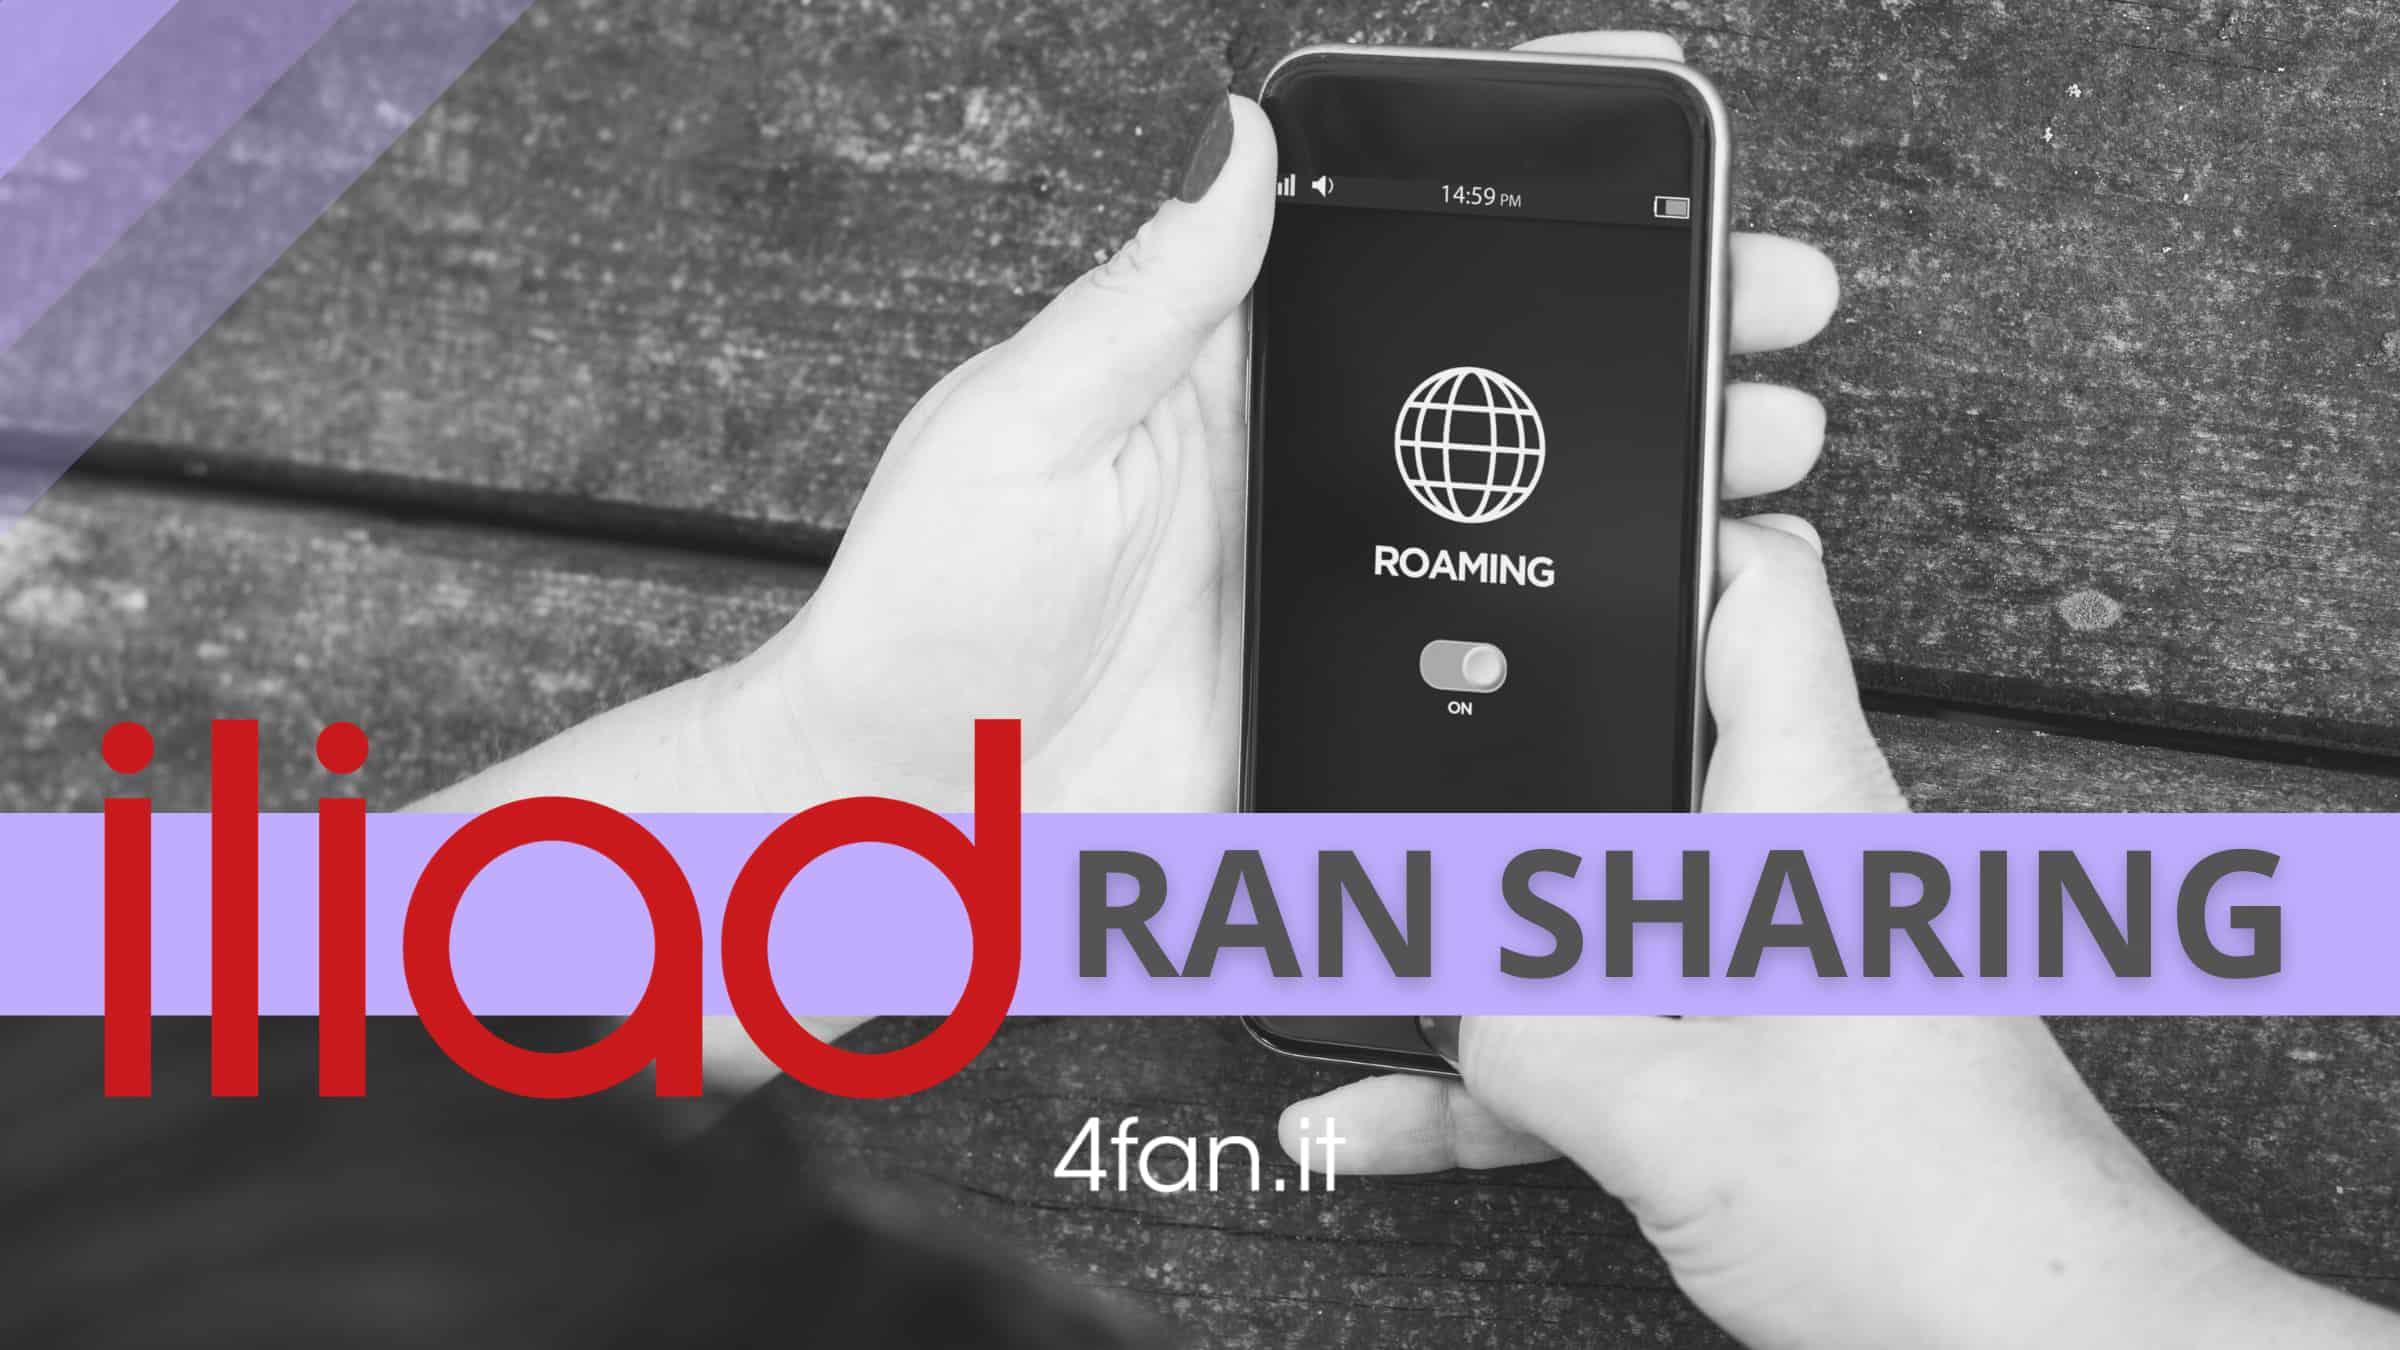 Iliad ran sharing